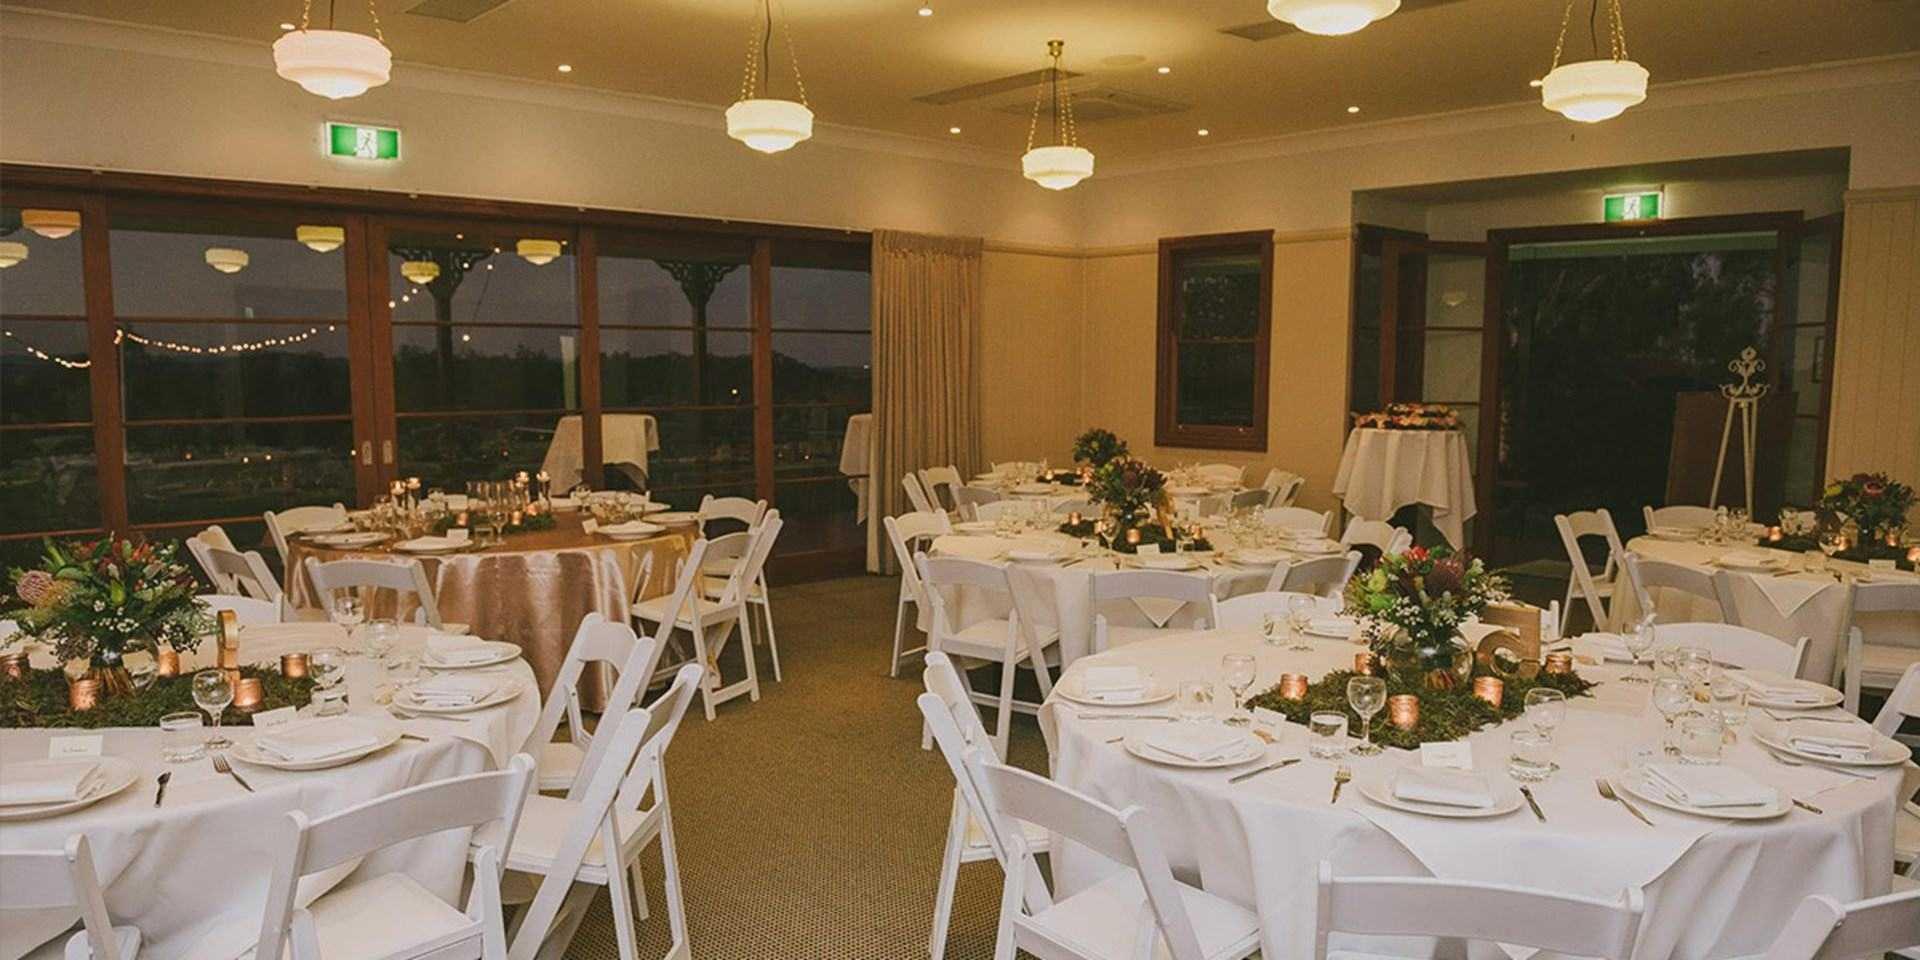 Wedding Venue - Spicers Hidden Vale - The Laidley Room 2 on Veilability